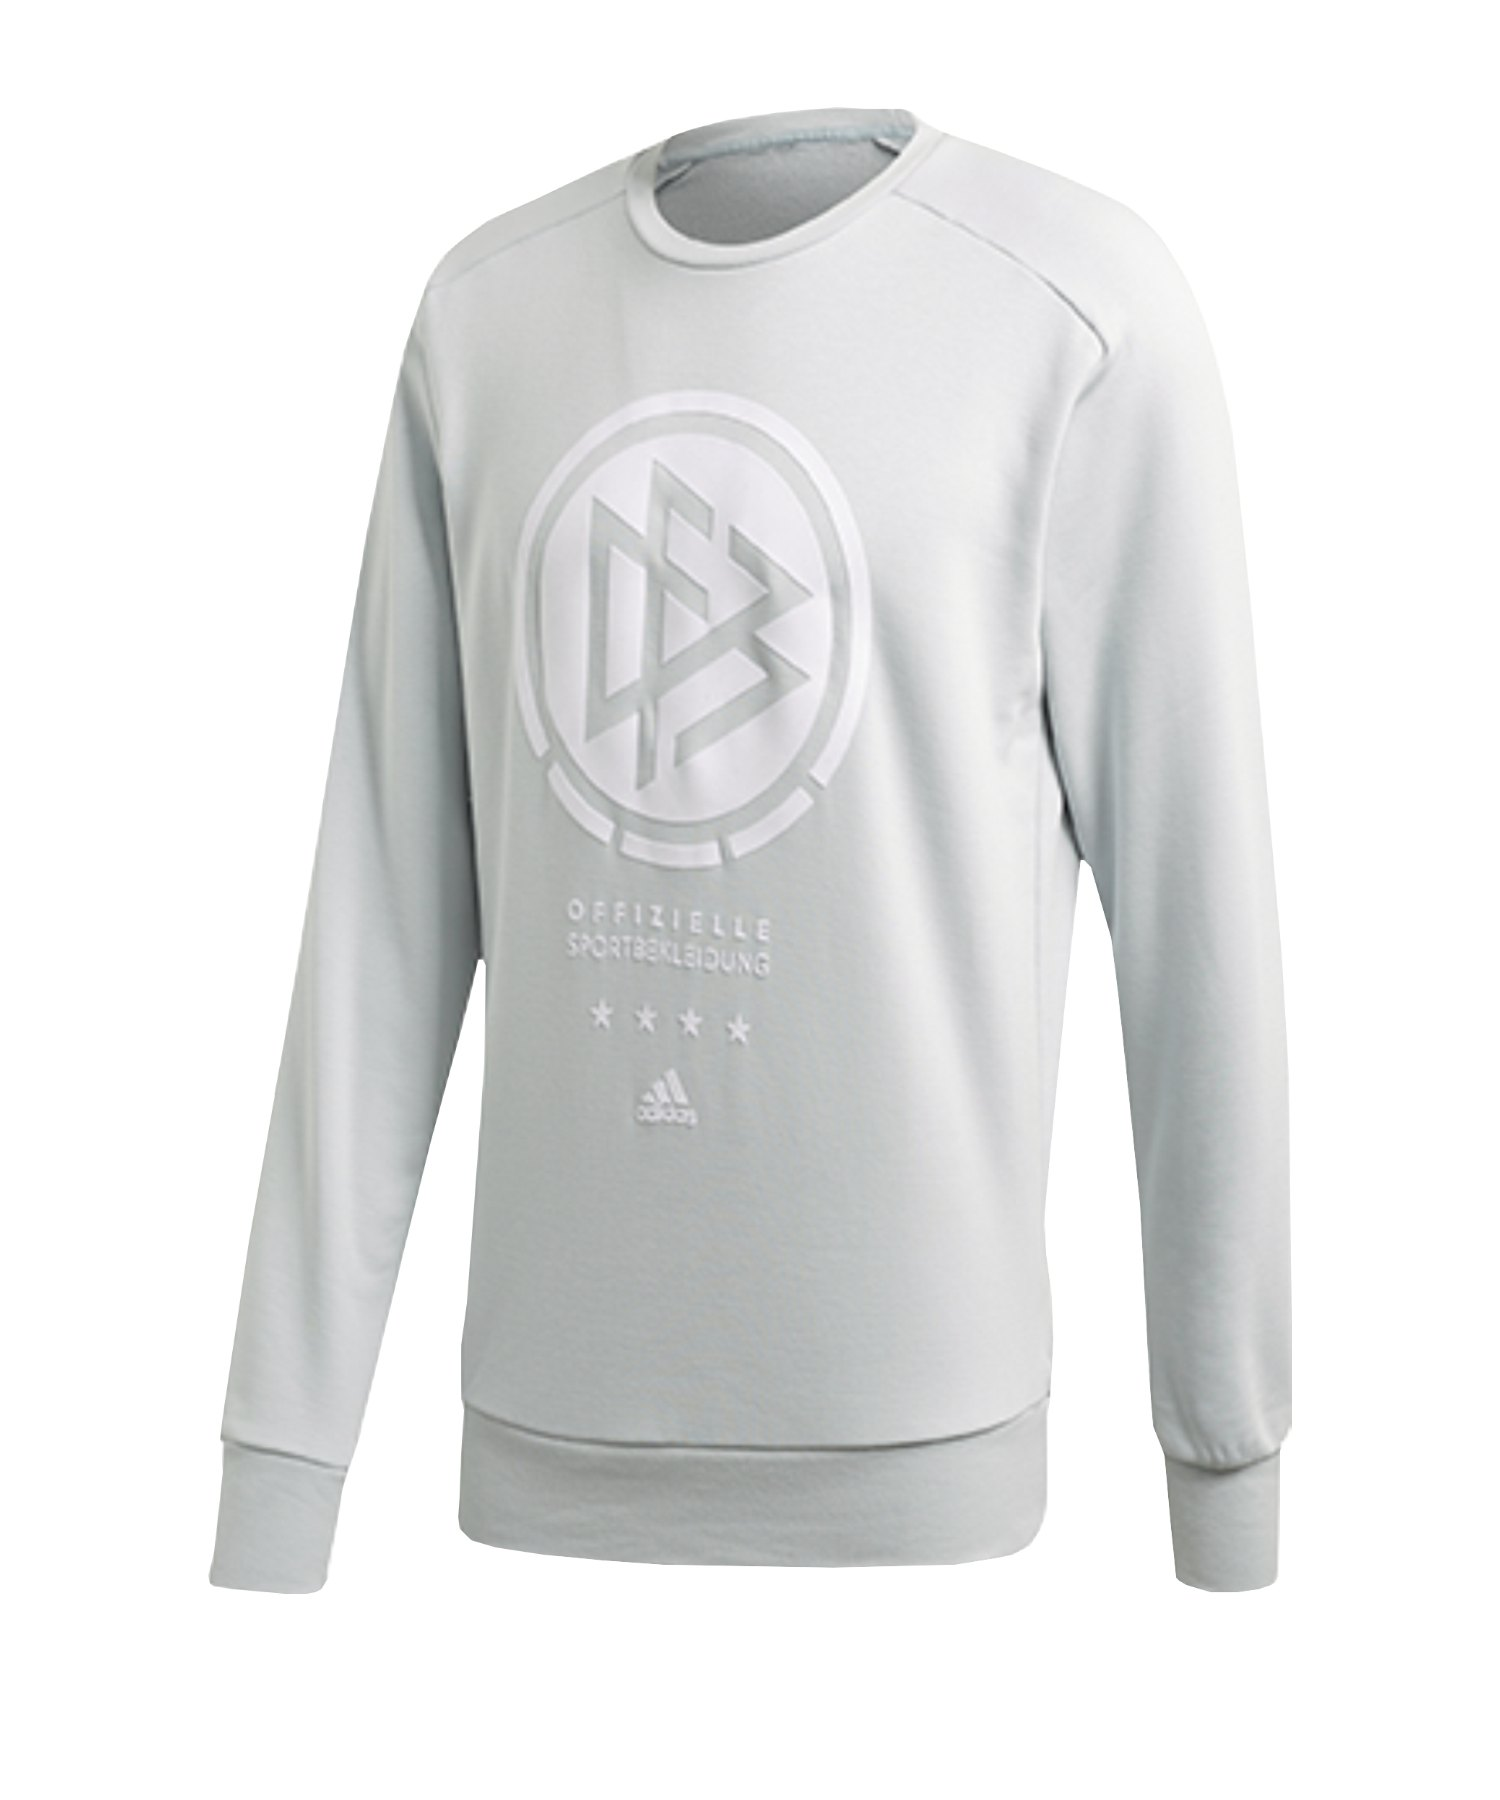 adidas DFB Deutschland SSP Sweatshirt Grau - grau